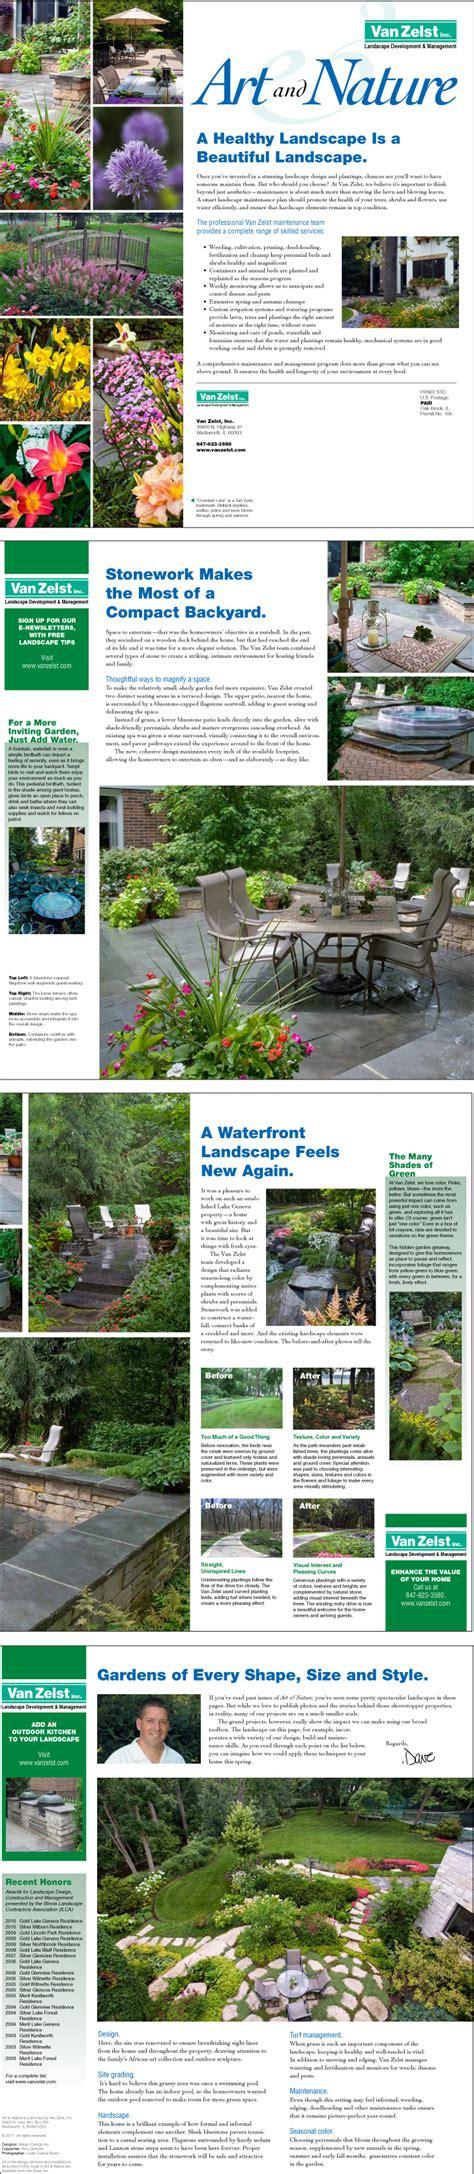 garden home management